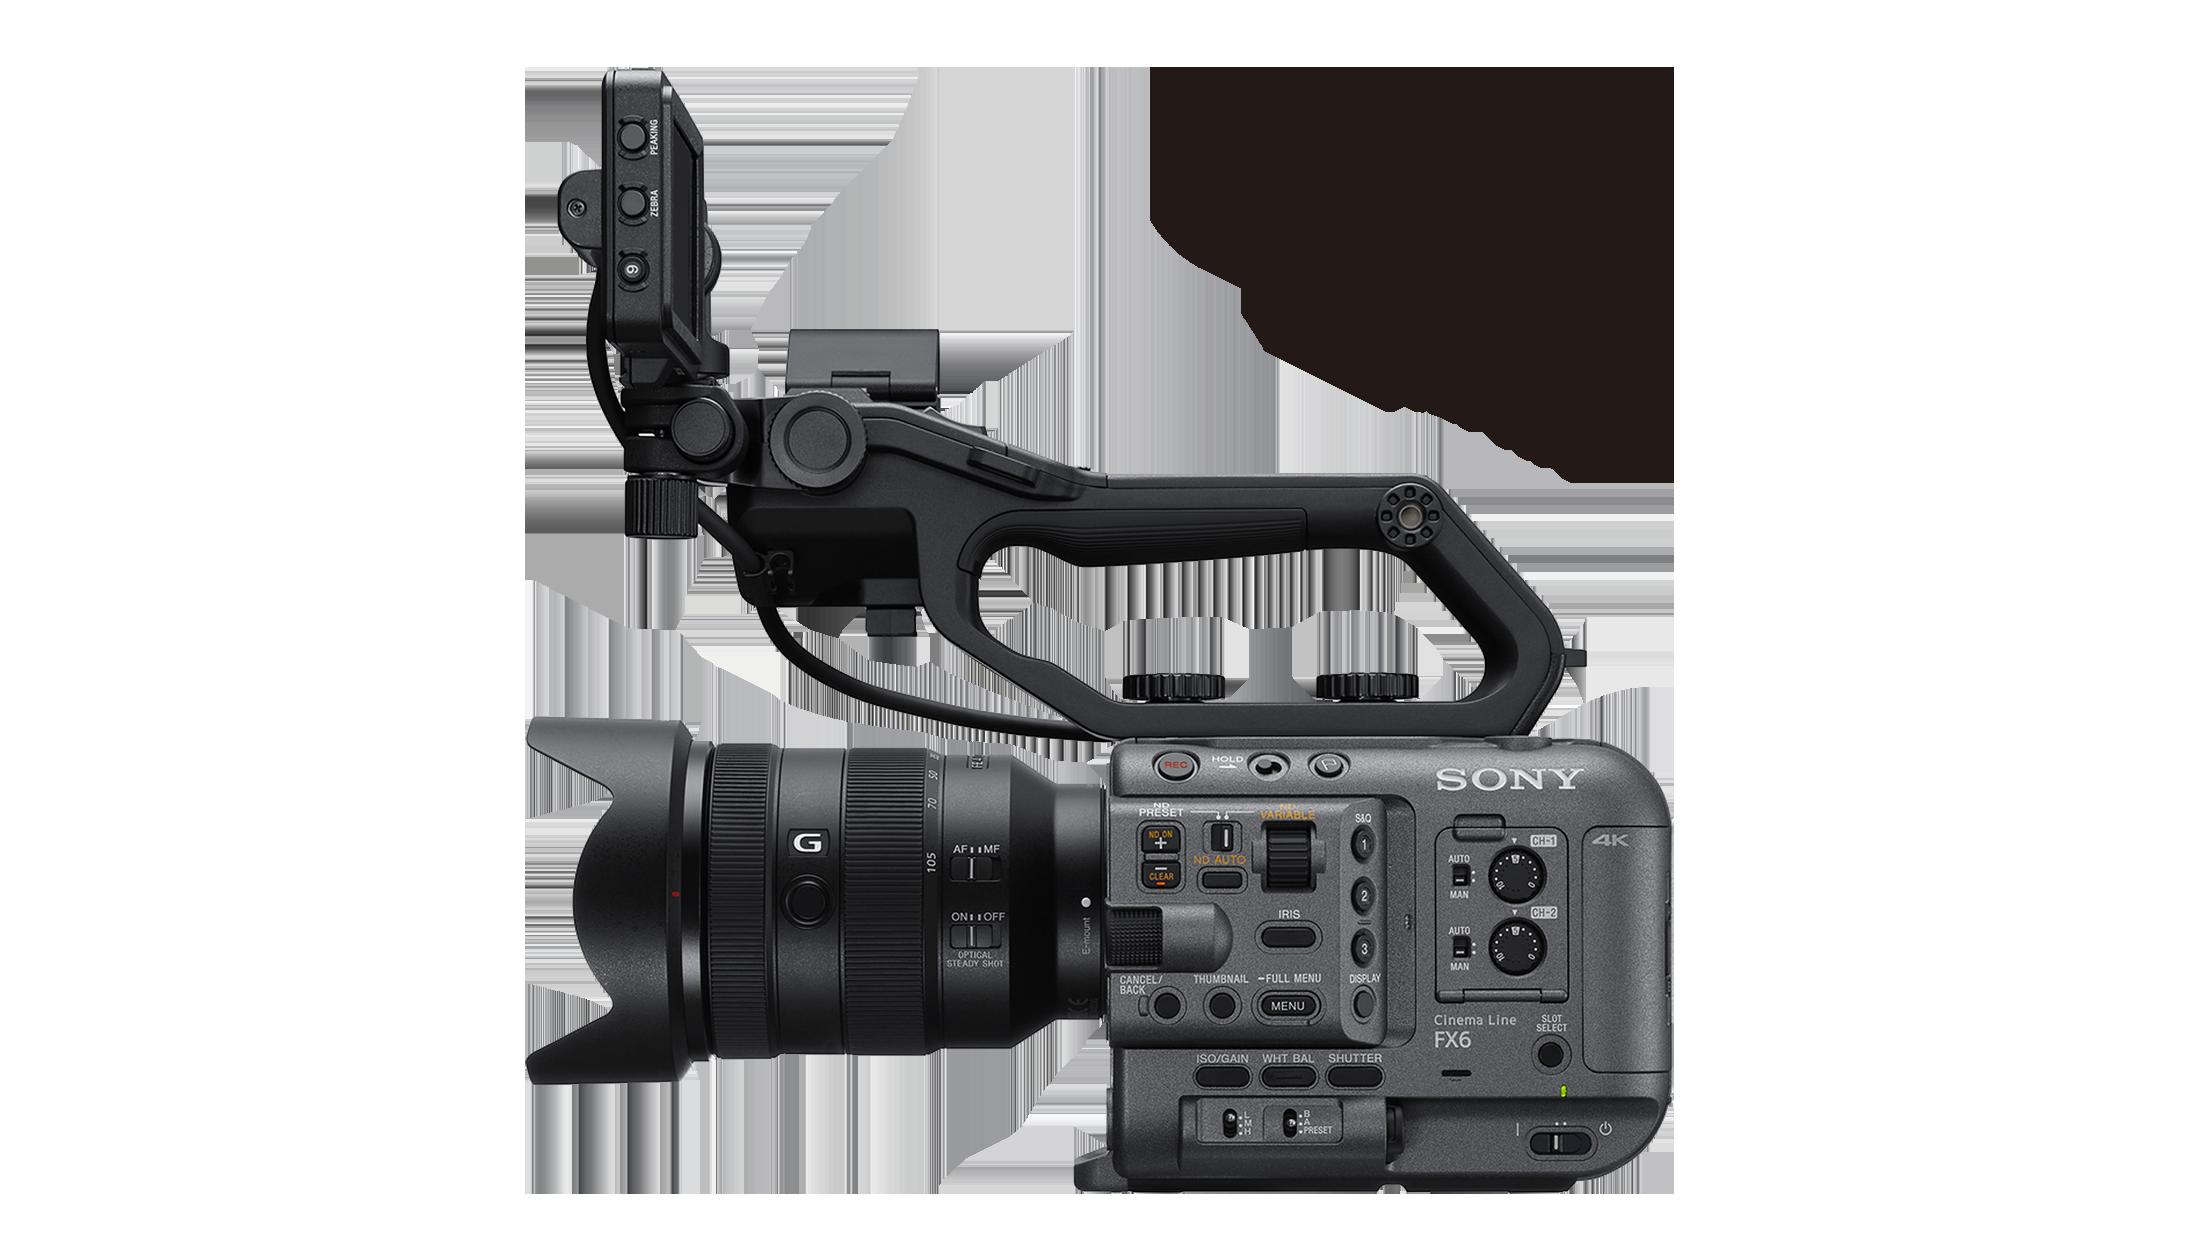 Side view of FX6 full-frame camcorder